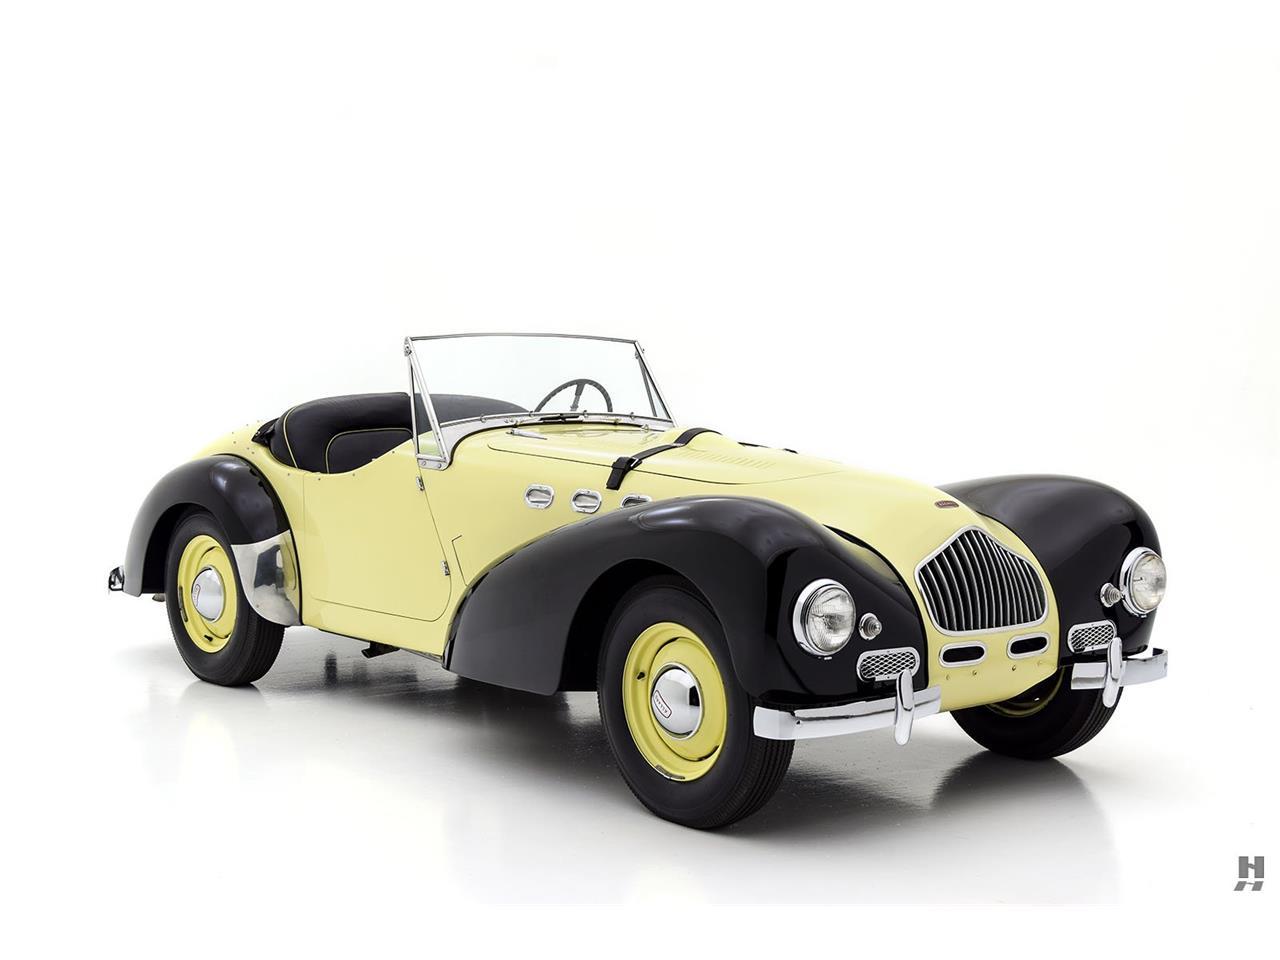 1951 Allard K2 (CC-1096519) for sale in Saint Louis, Missouri